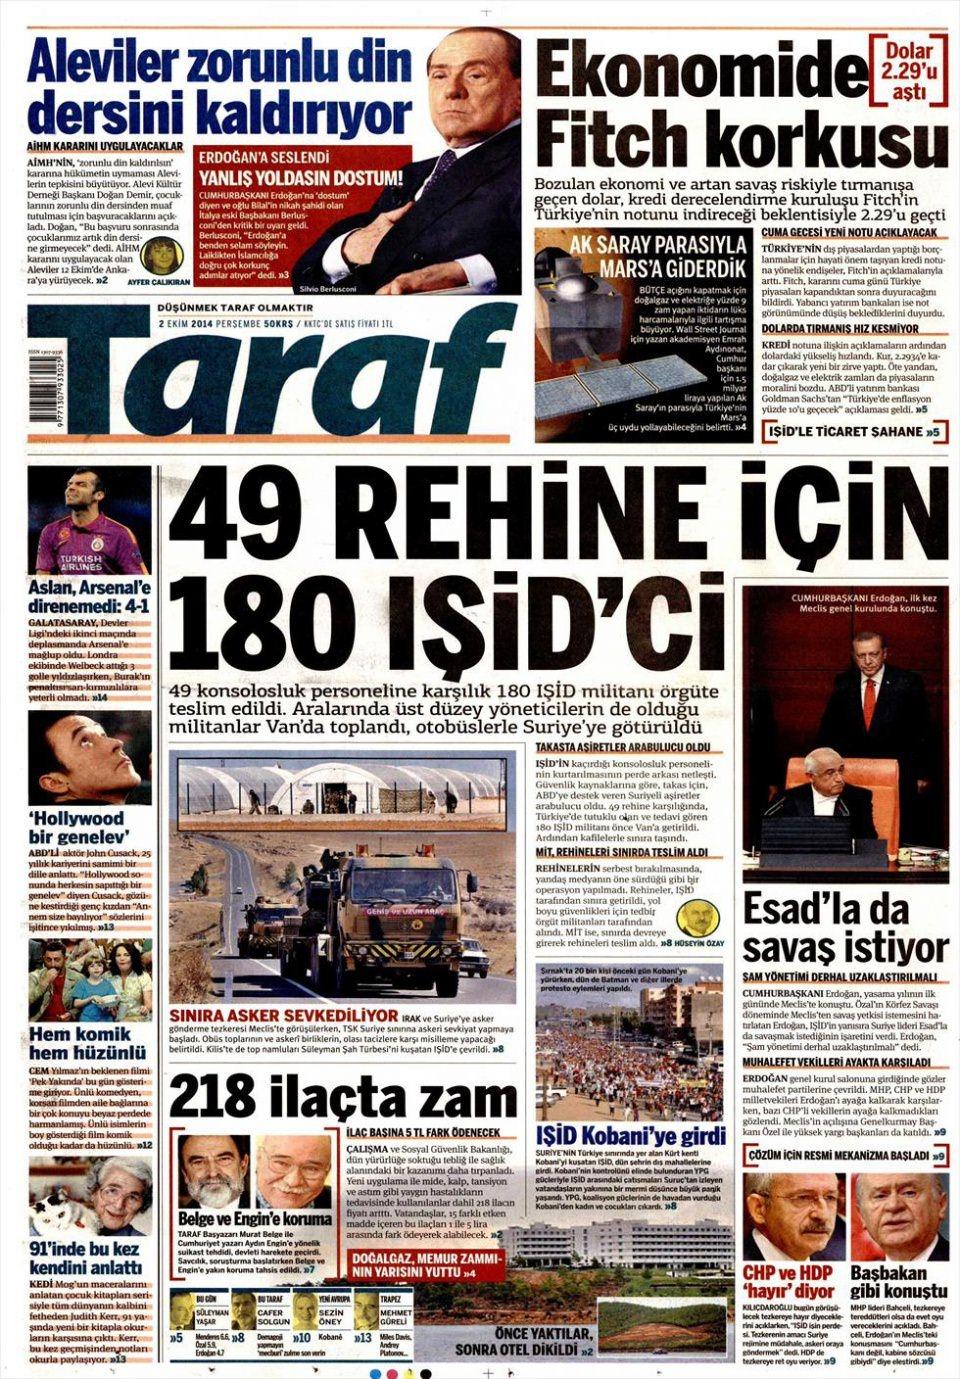 2 Ekim 2014 gazete manşetleri 19